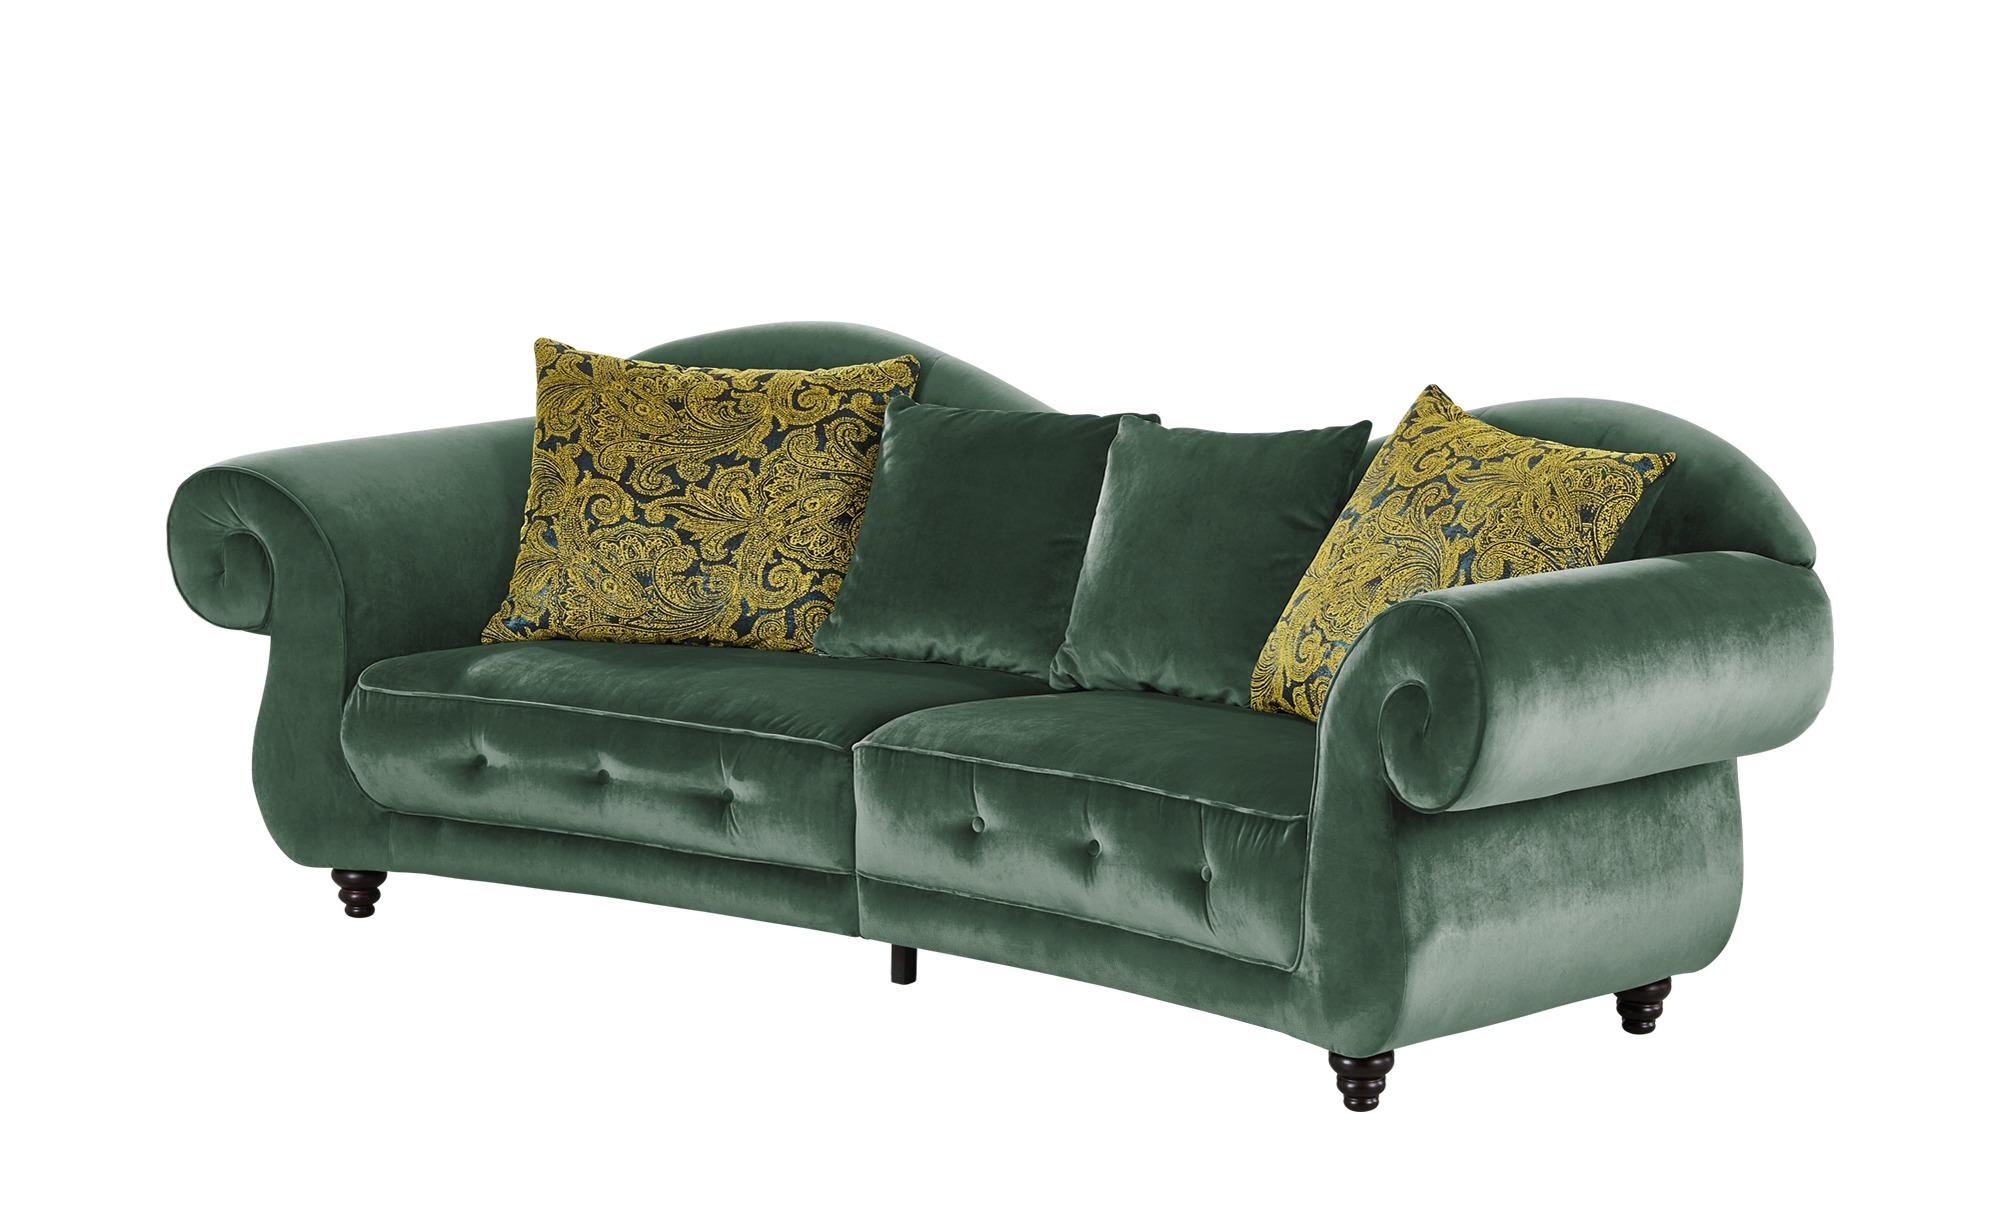 Design Big Sofa Nobody, gefunden bei Möbel Höffner